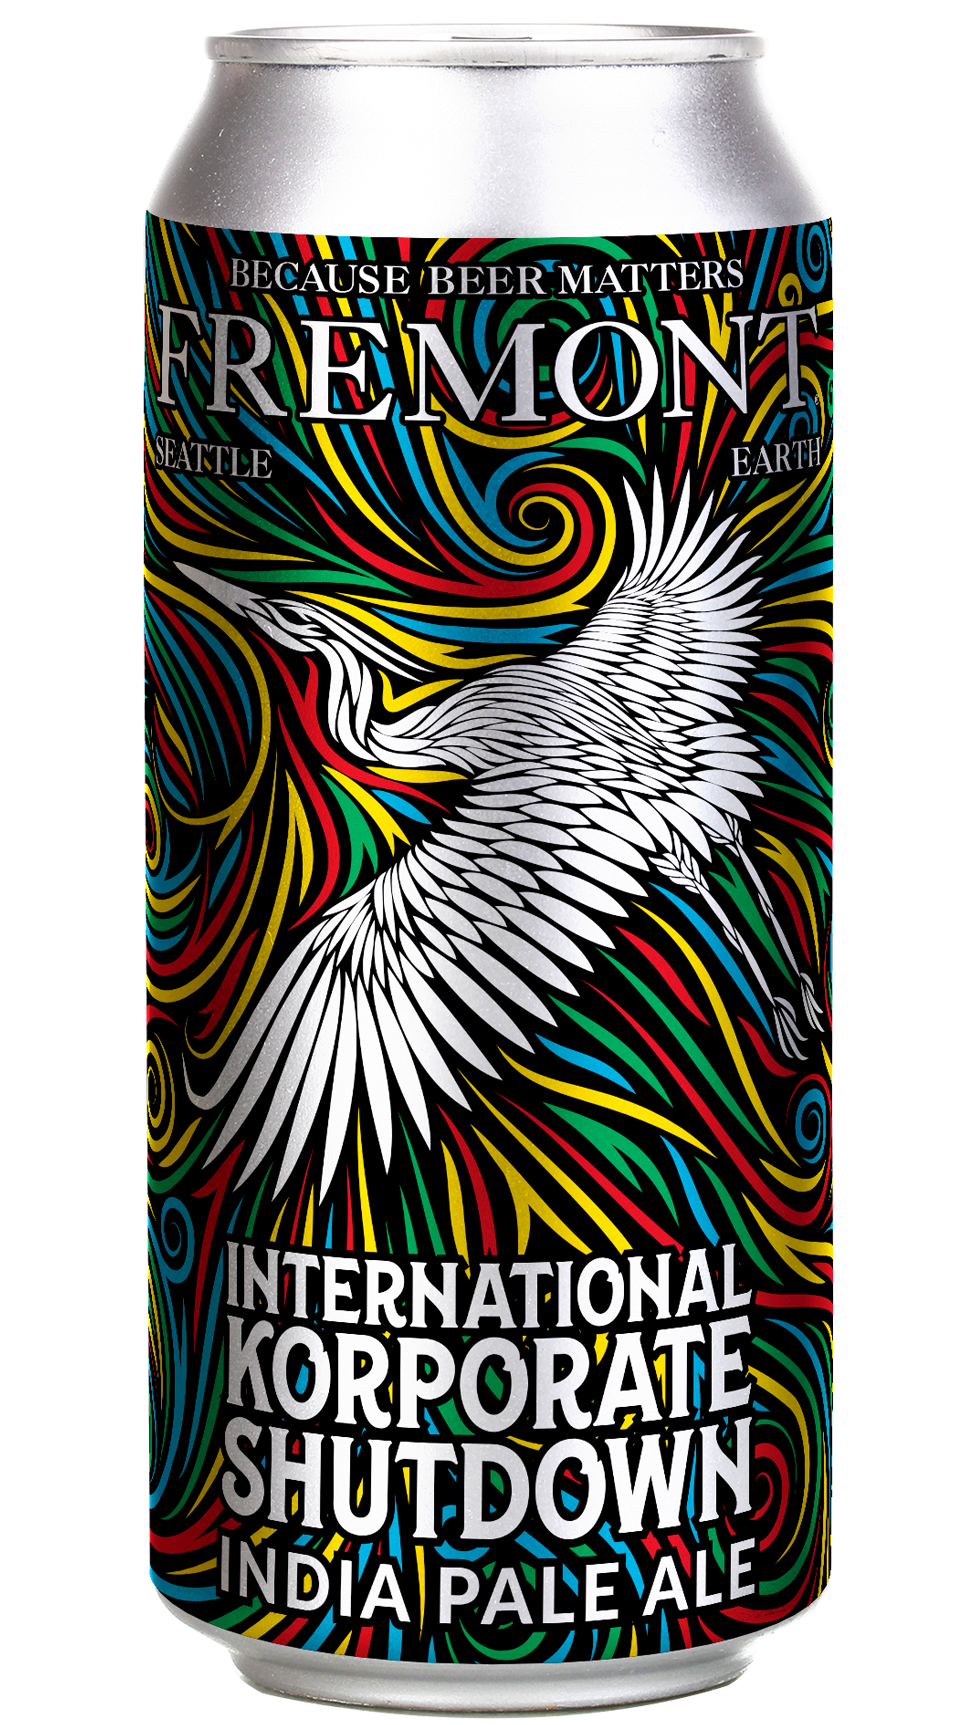 Fremont-International-Korporate-Shutdown